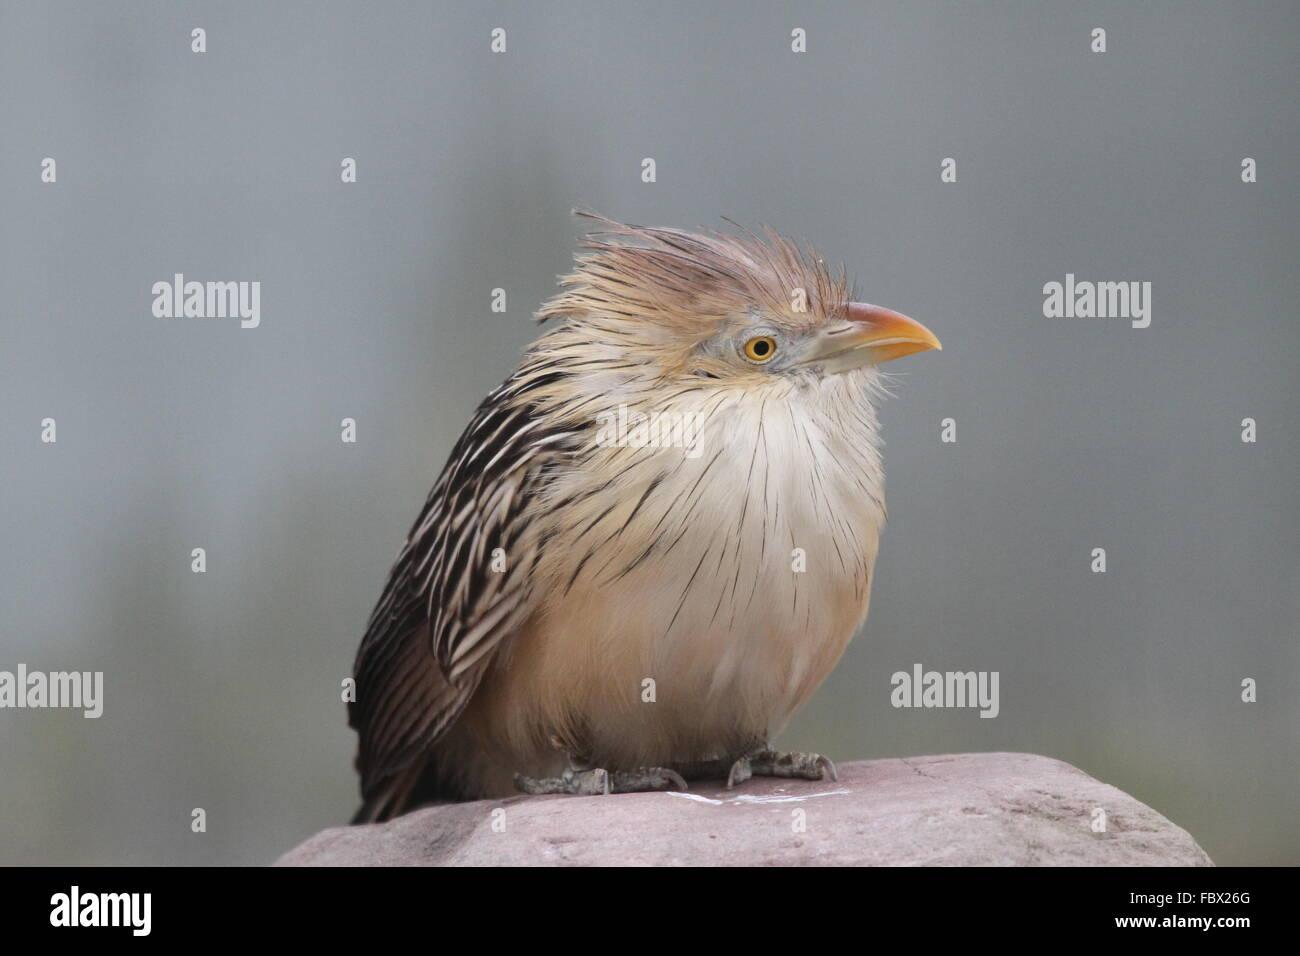 Guira Cuckoo 001 - Stock Image